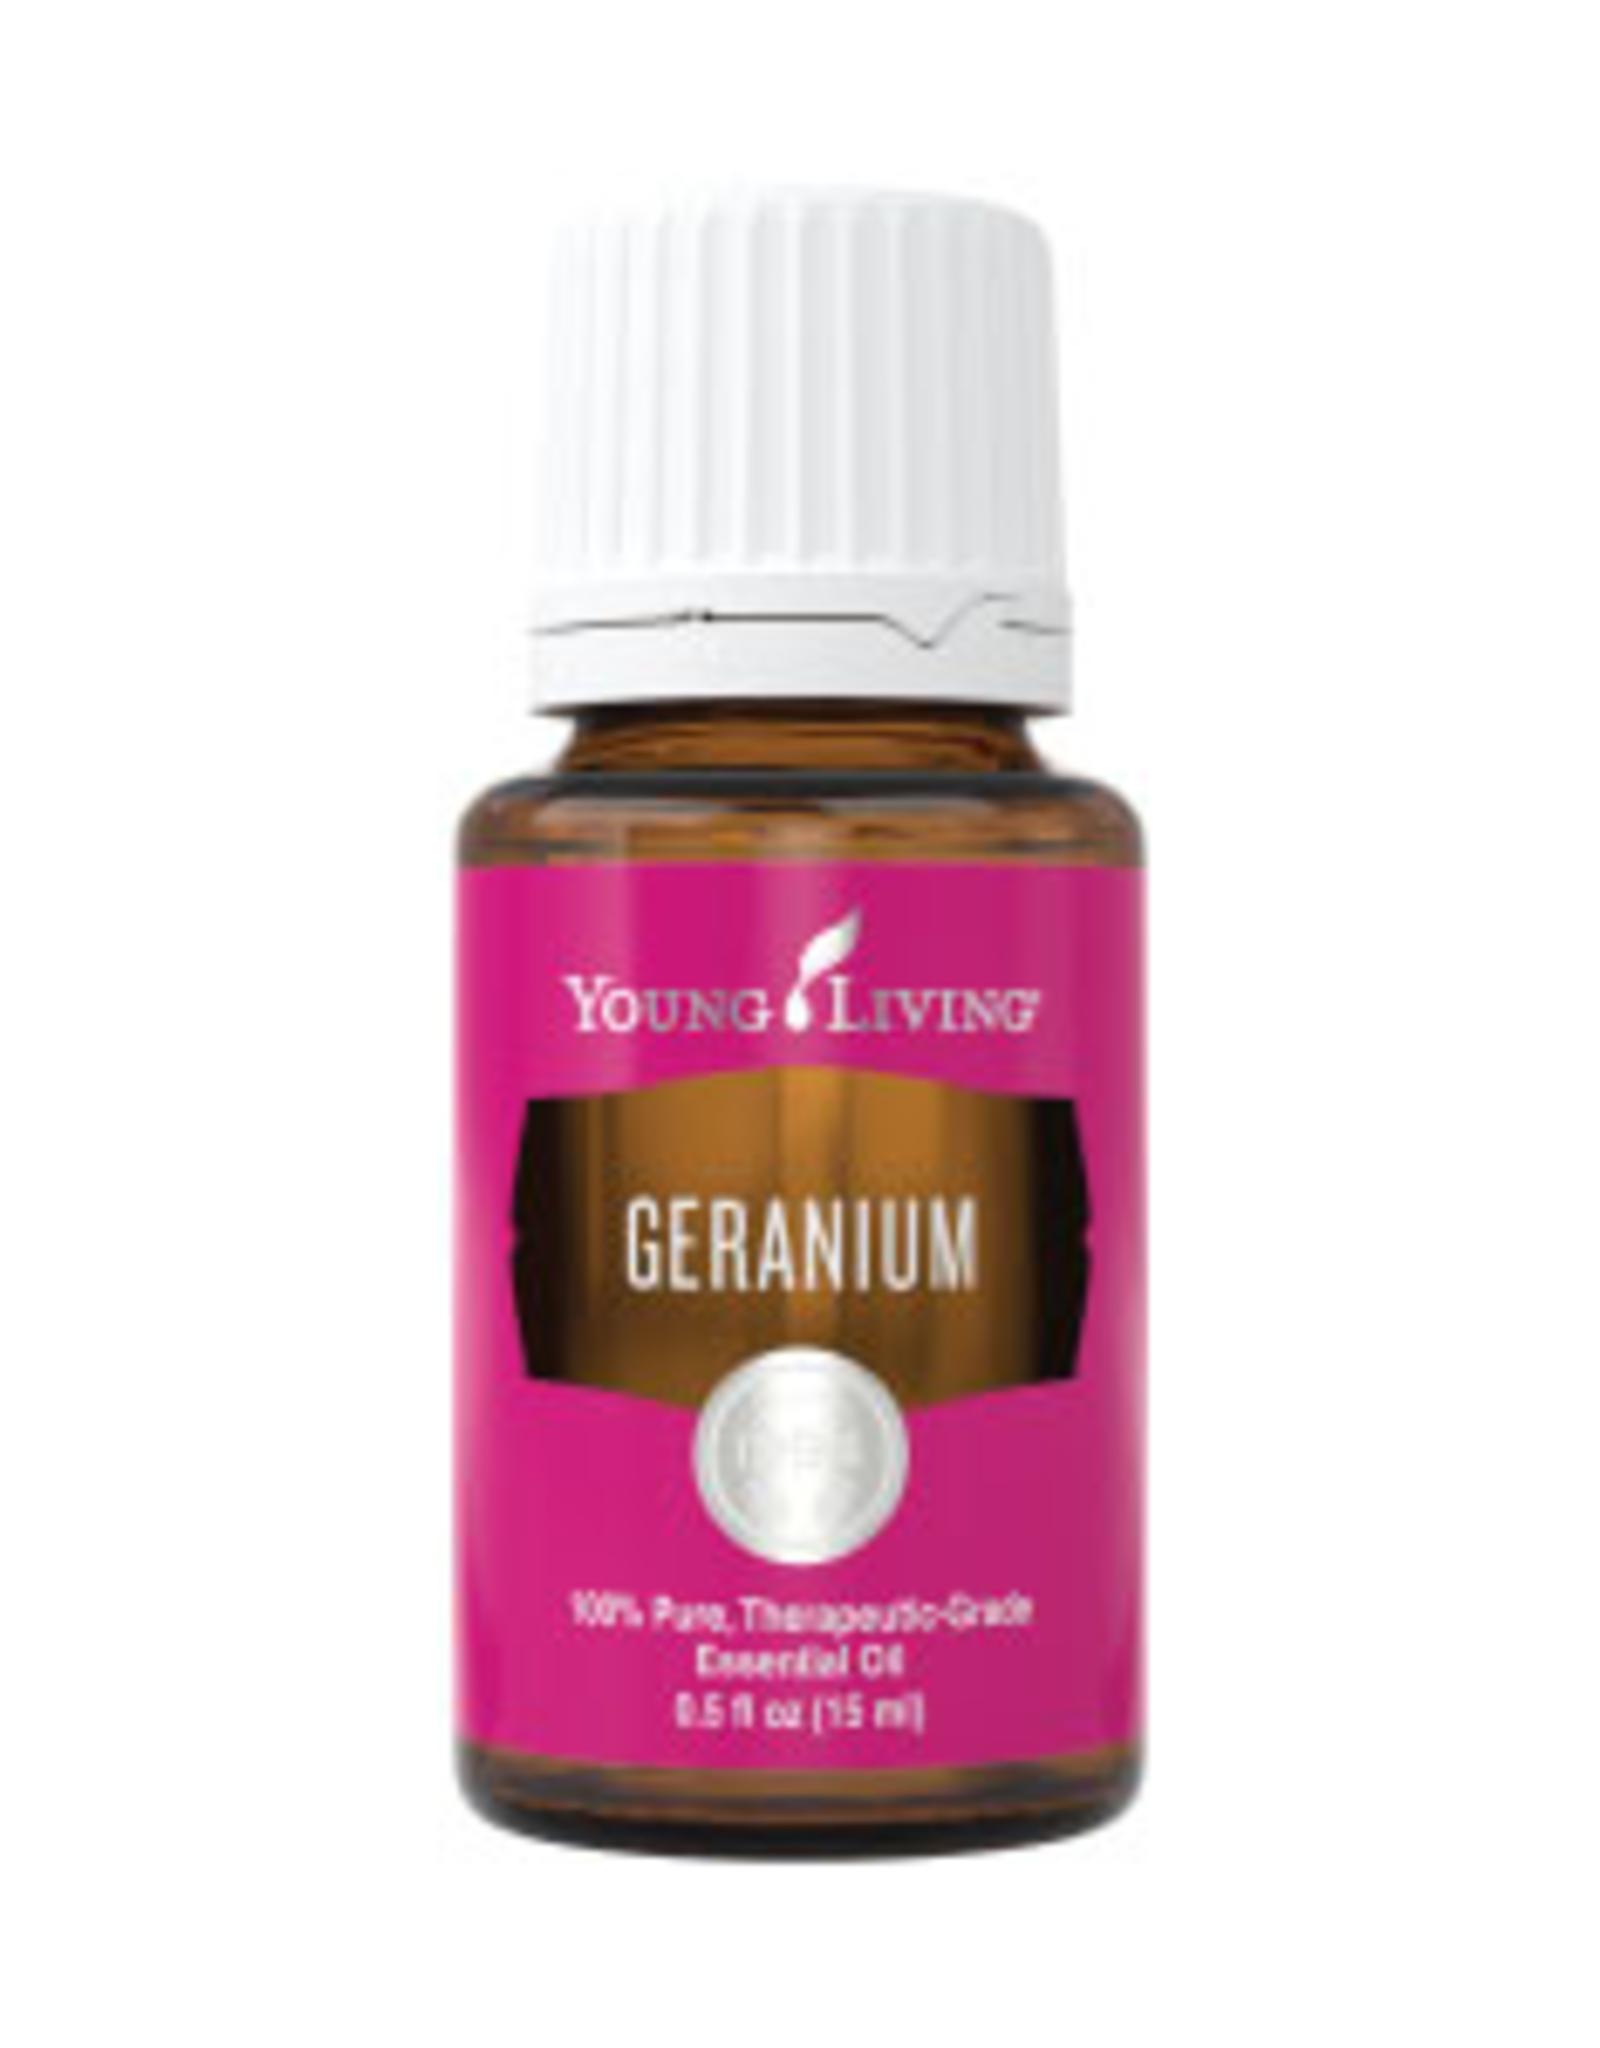 Young Living Geranium YL 15 ml